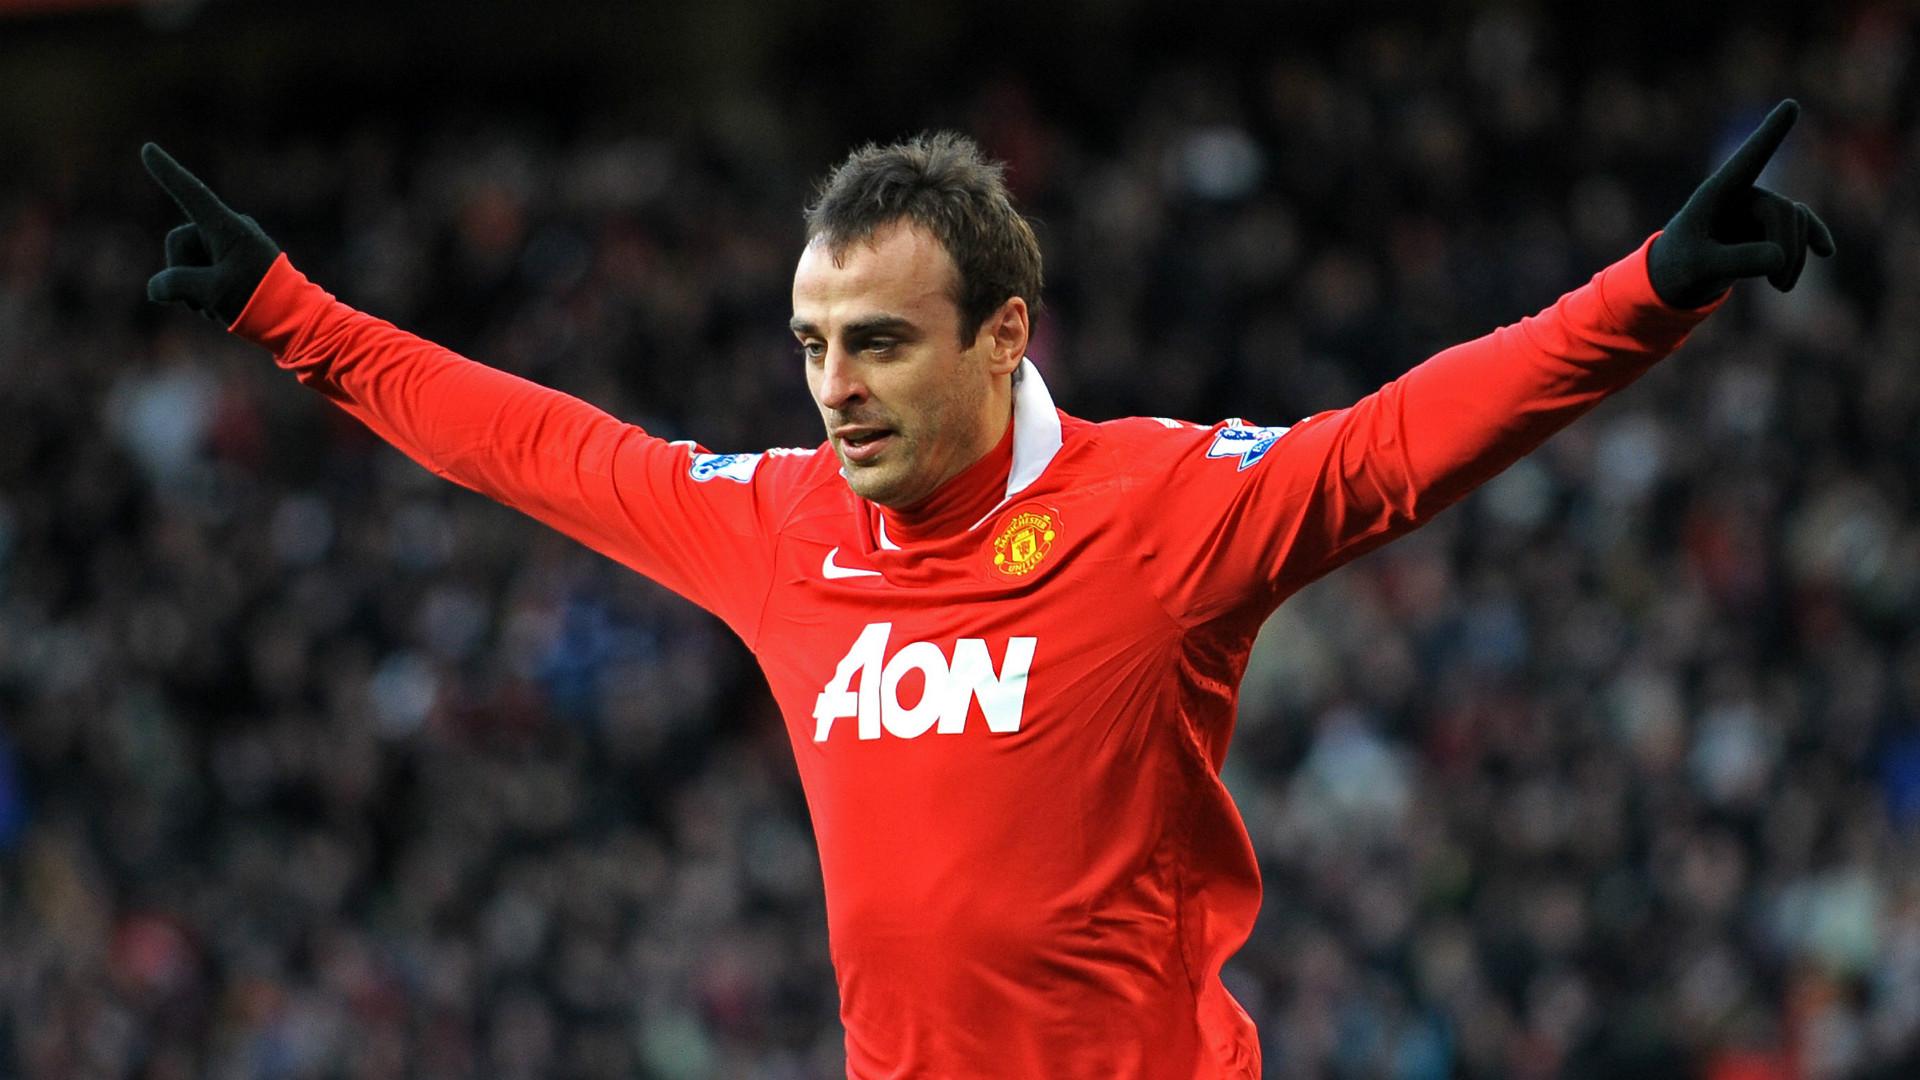 Swansea admit interest in veteran striker Berbatov